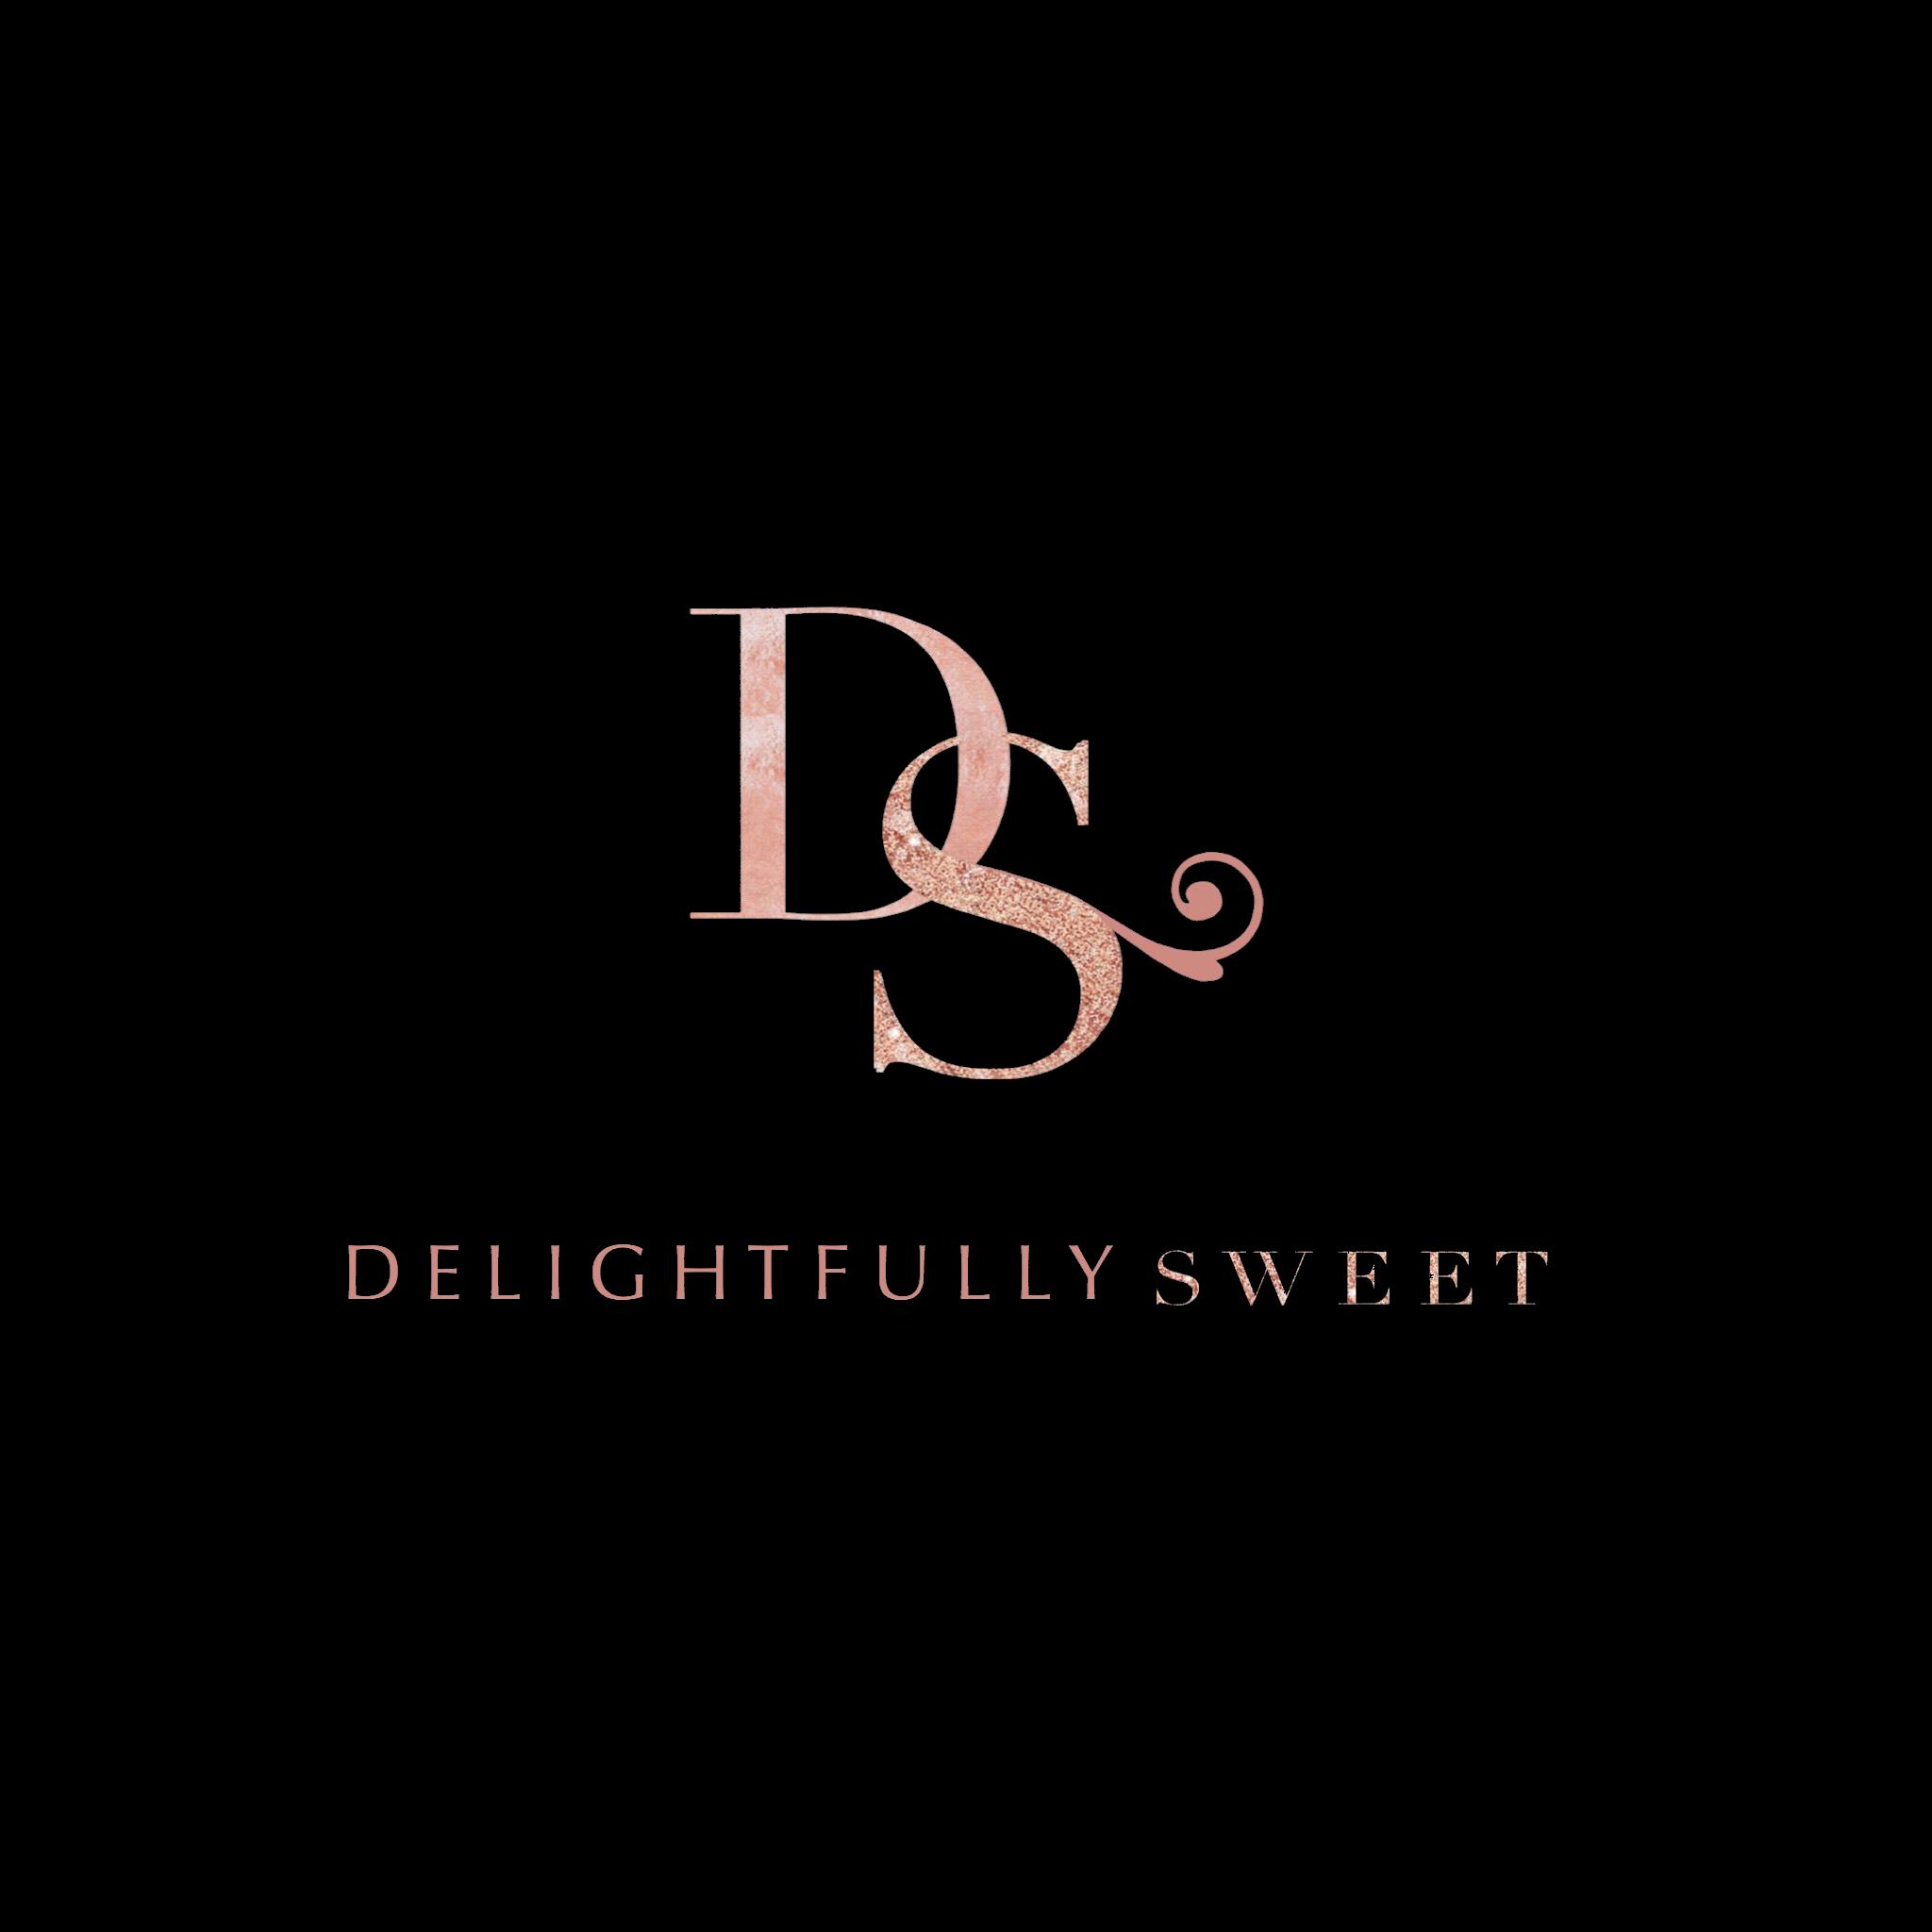 Delightfully Sweet